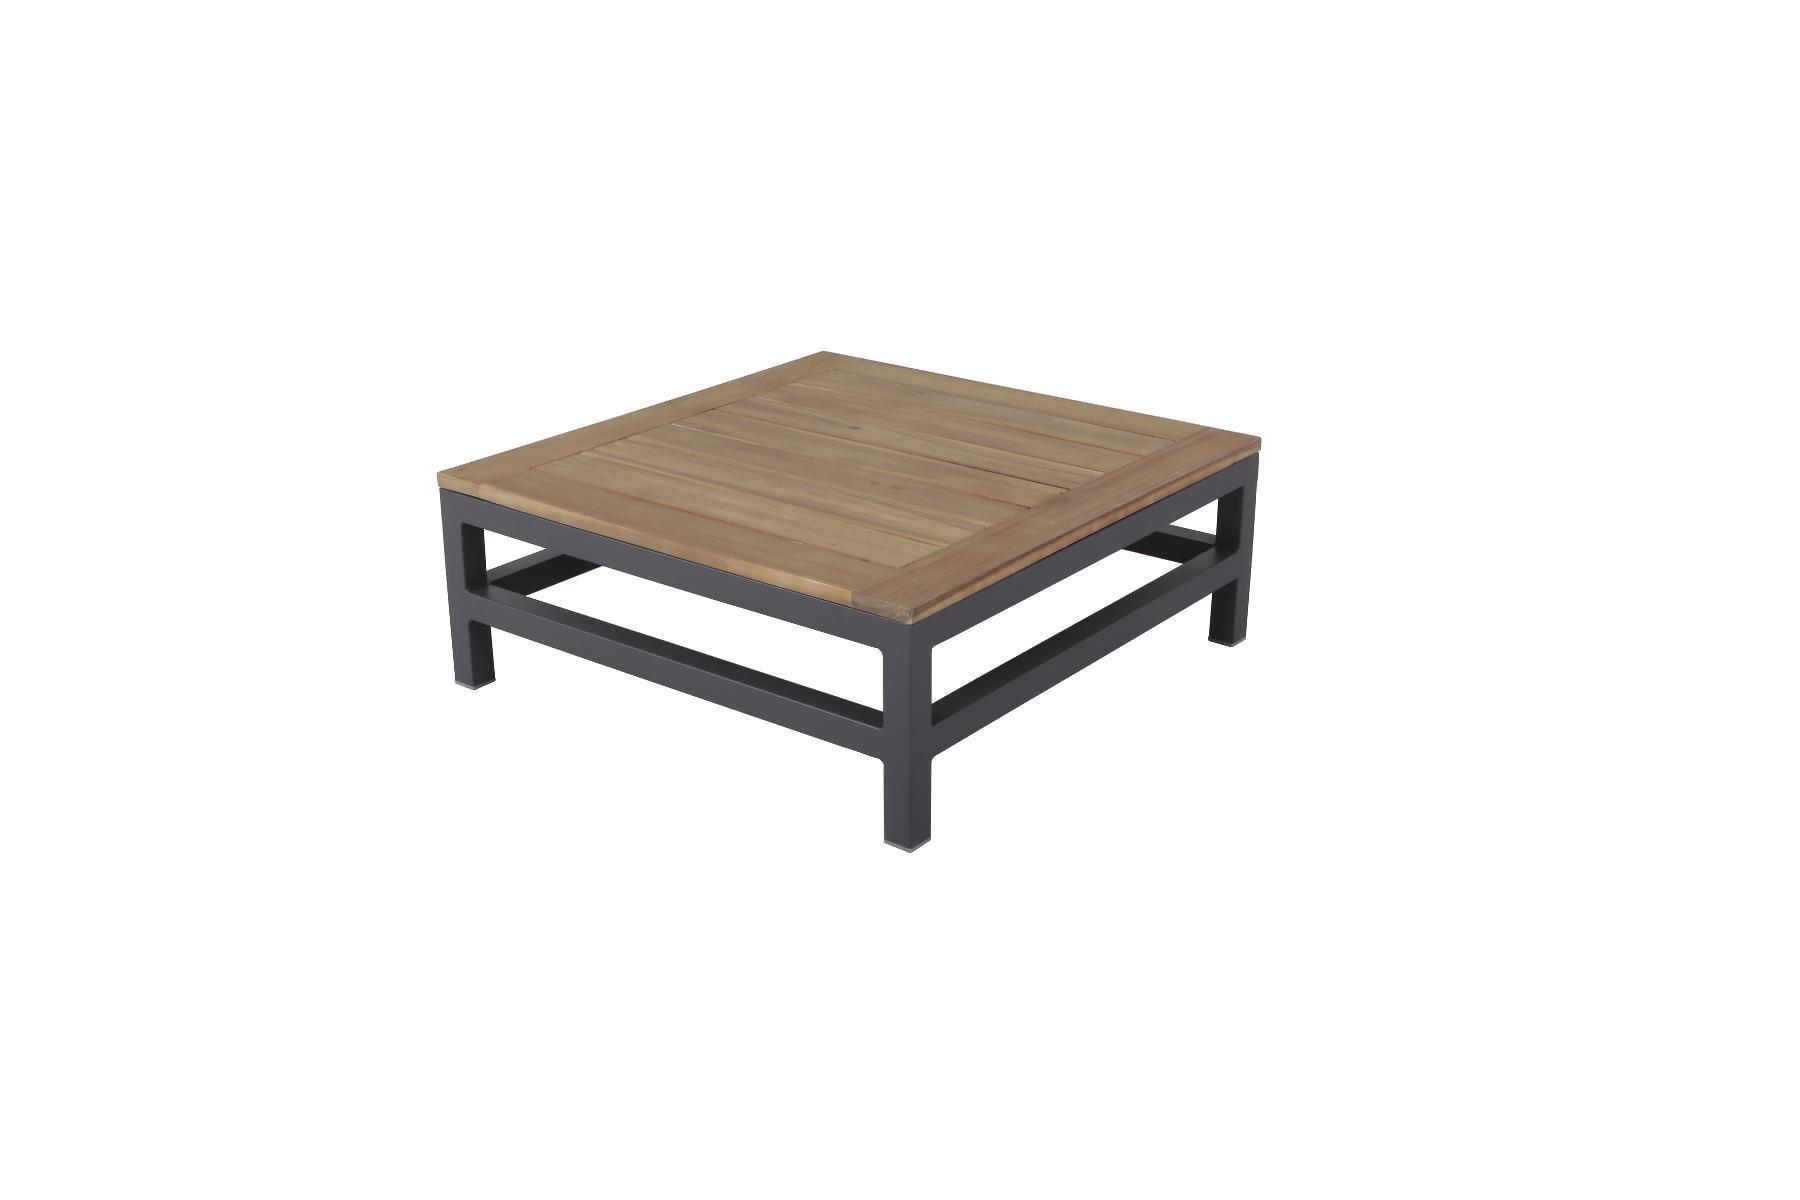 Betis lounge table 80x80x31 (1071)